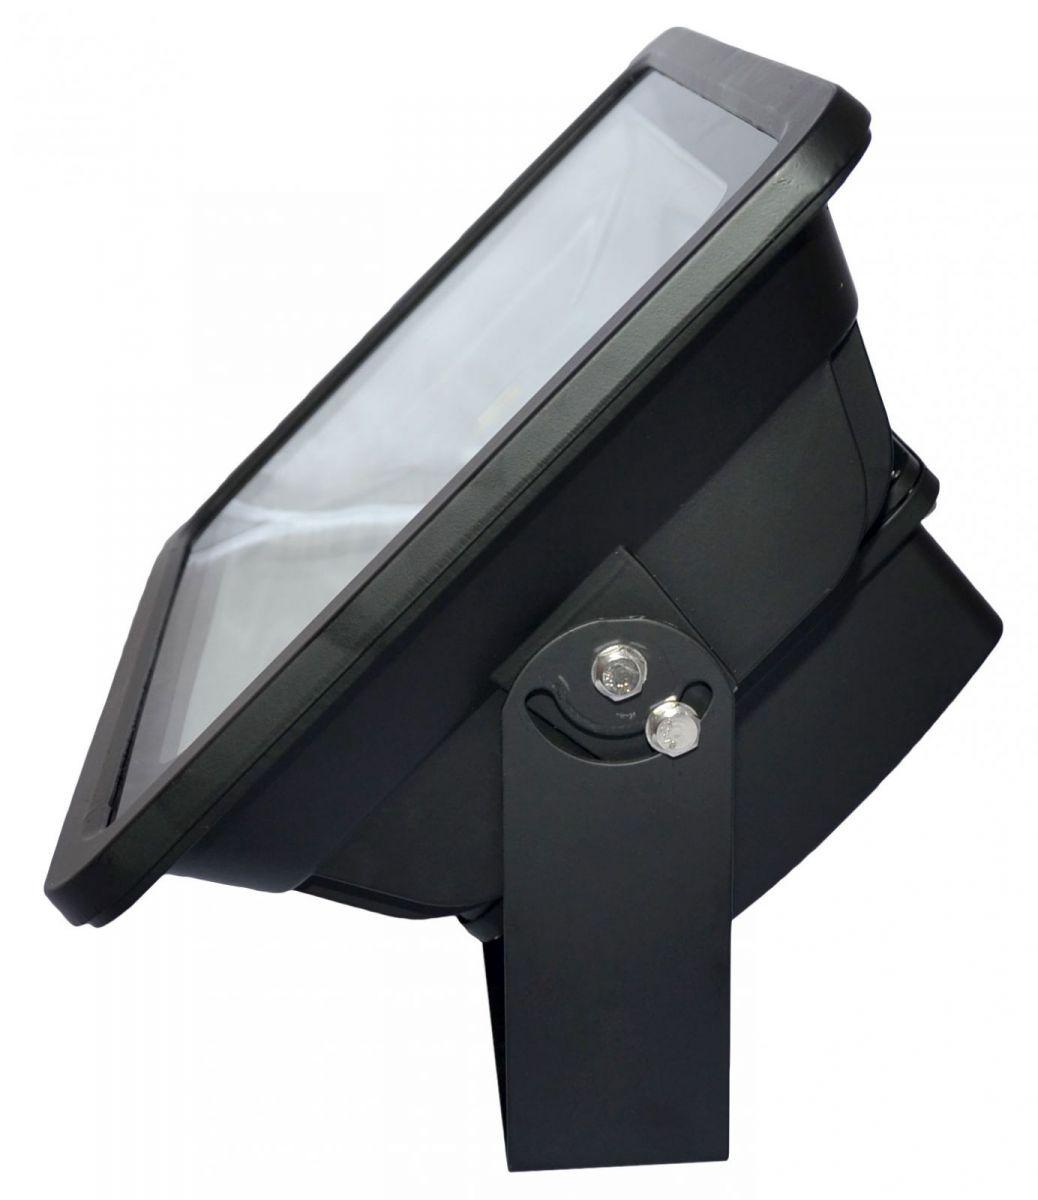 Proiettore a led 150w ac85 265v 6500k luce bianca fredda for Proiettore led